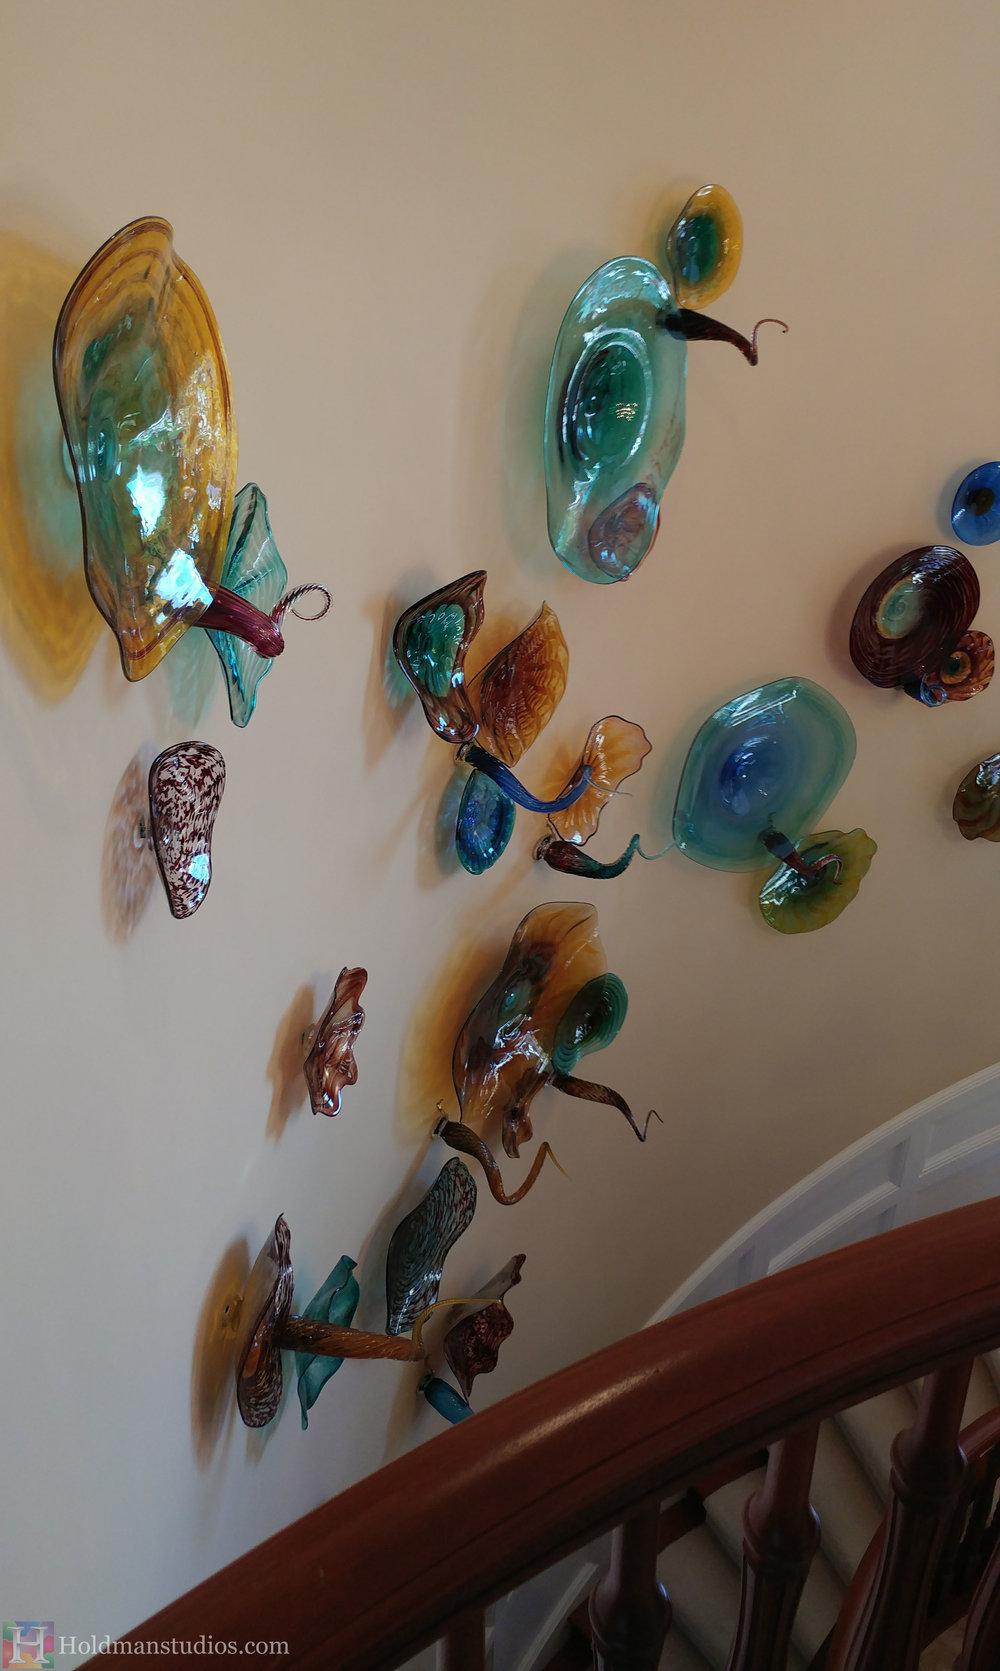 holdman-studios-hand-blown-glass-platters-bowls-tendrils-stair-wall-display-sideview.jpg